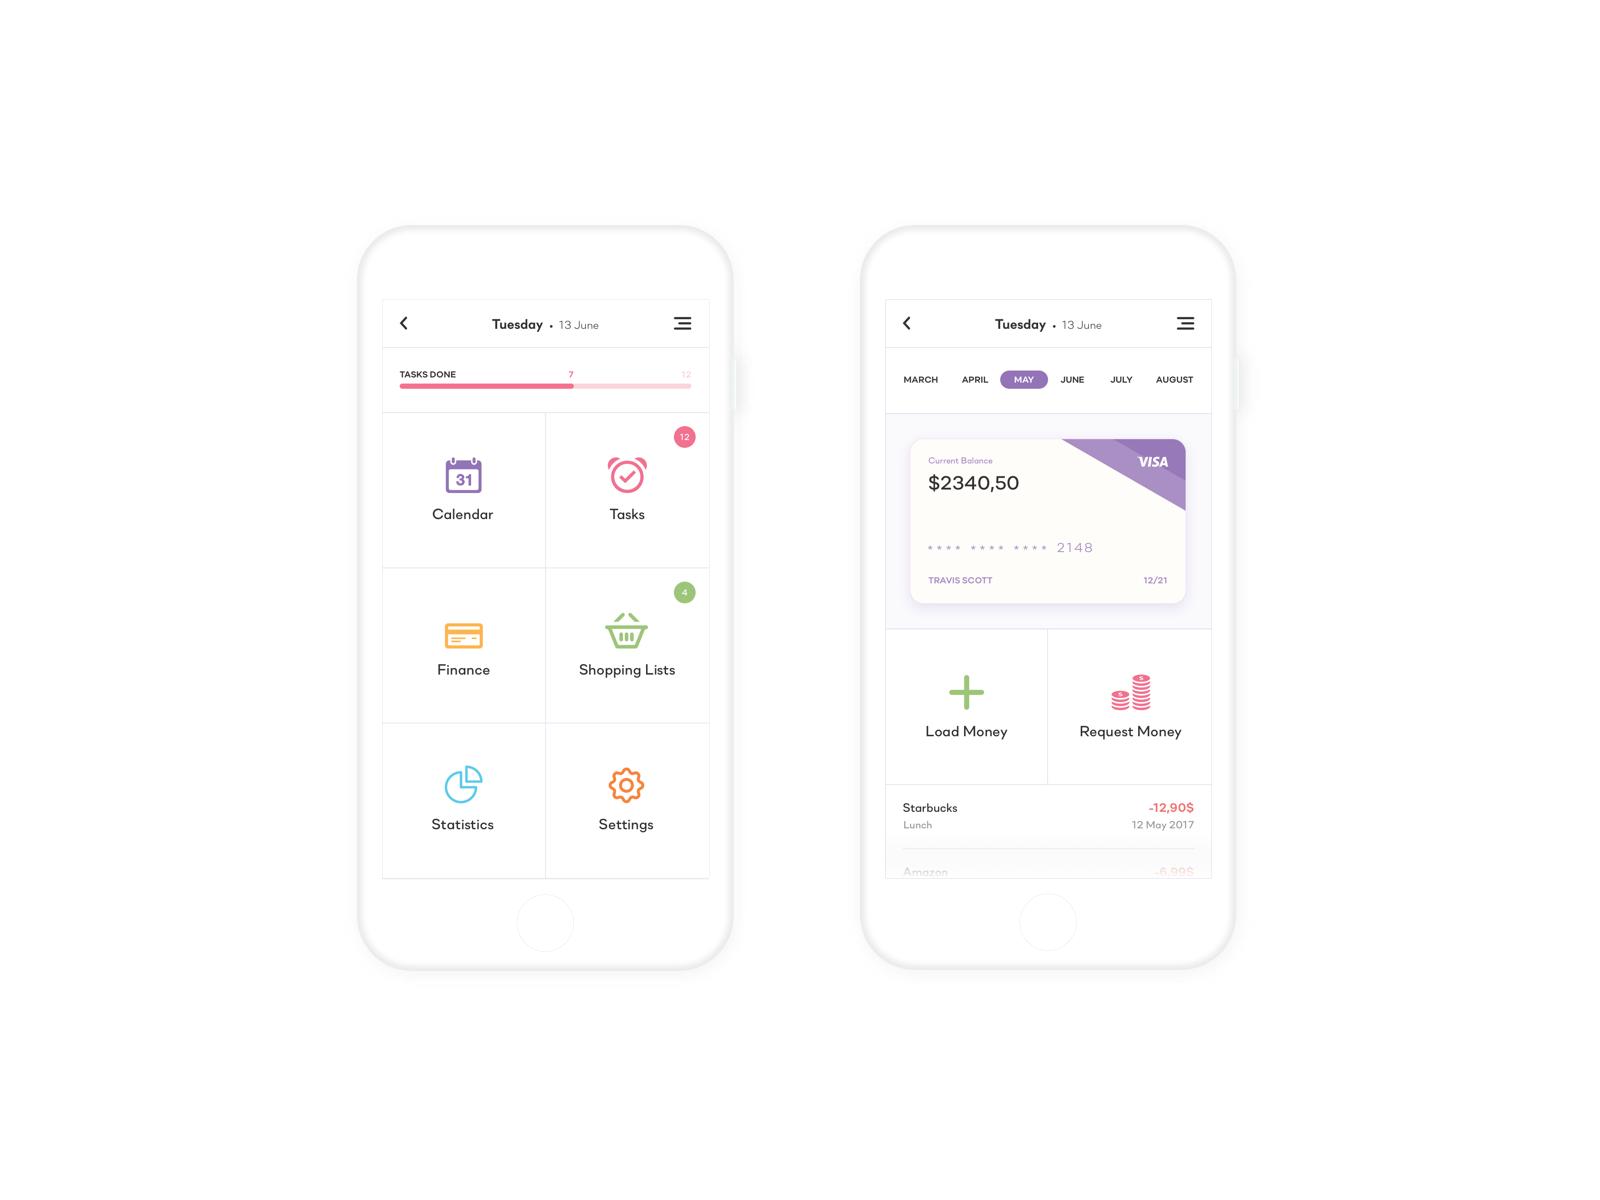 Iphone template copy 2 | UI/UX | Pinterest | User interface design ...